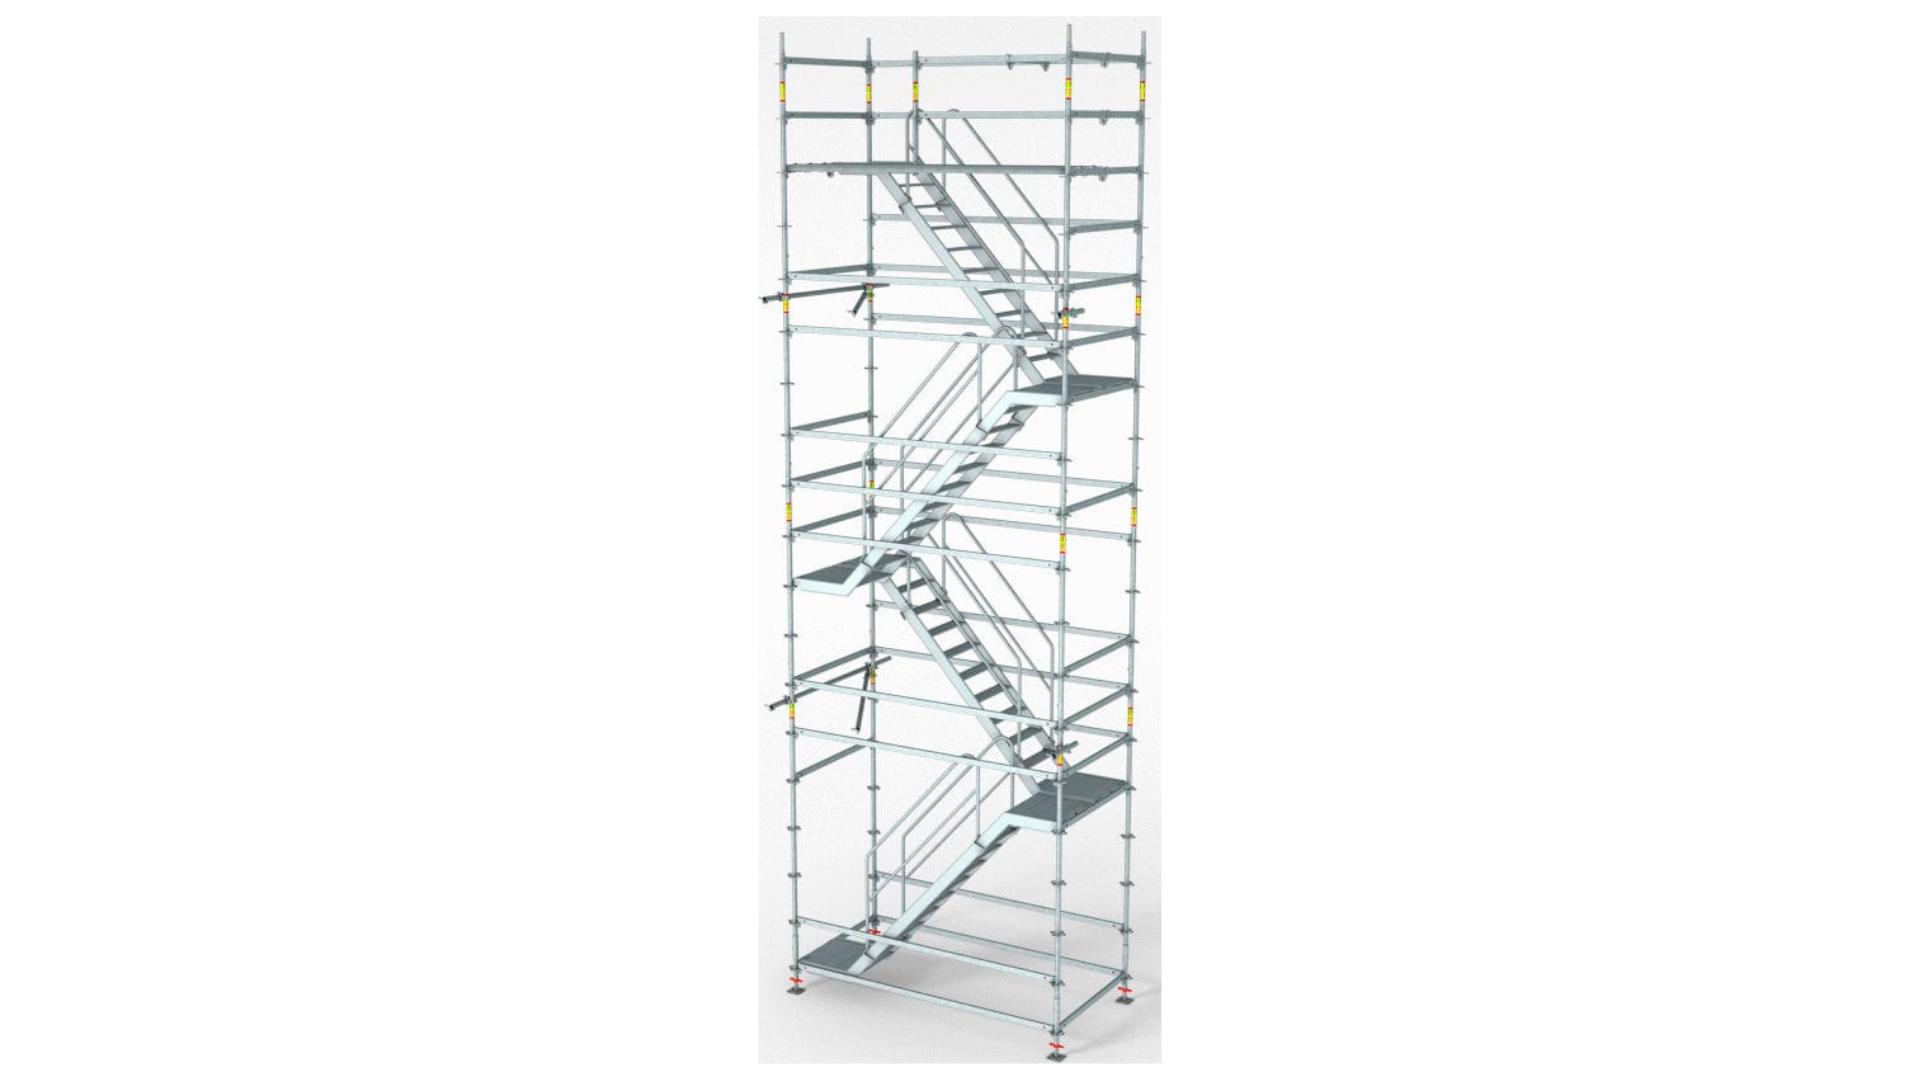 escada de acesso 01